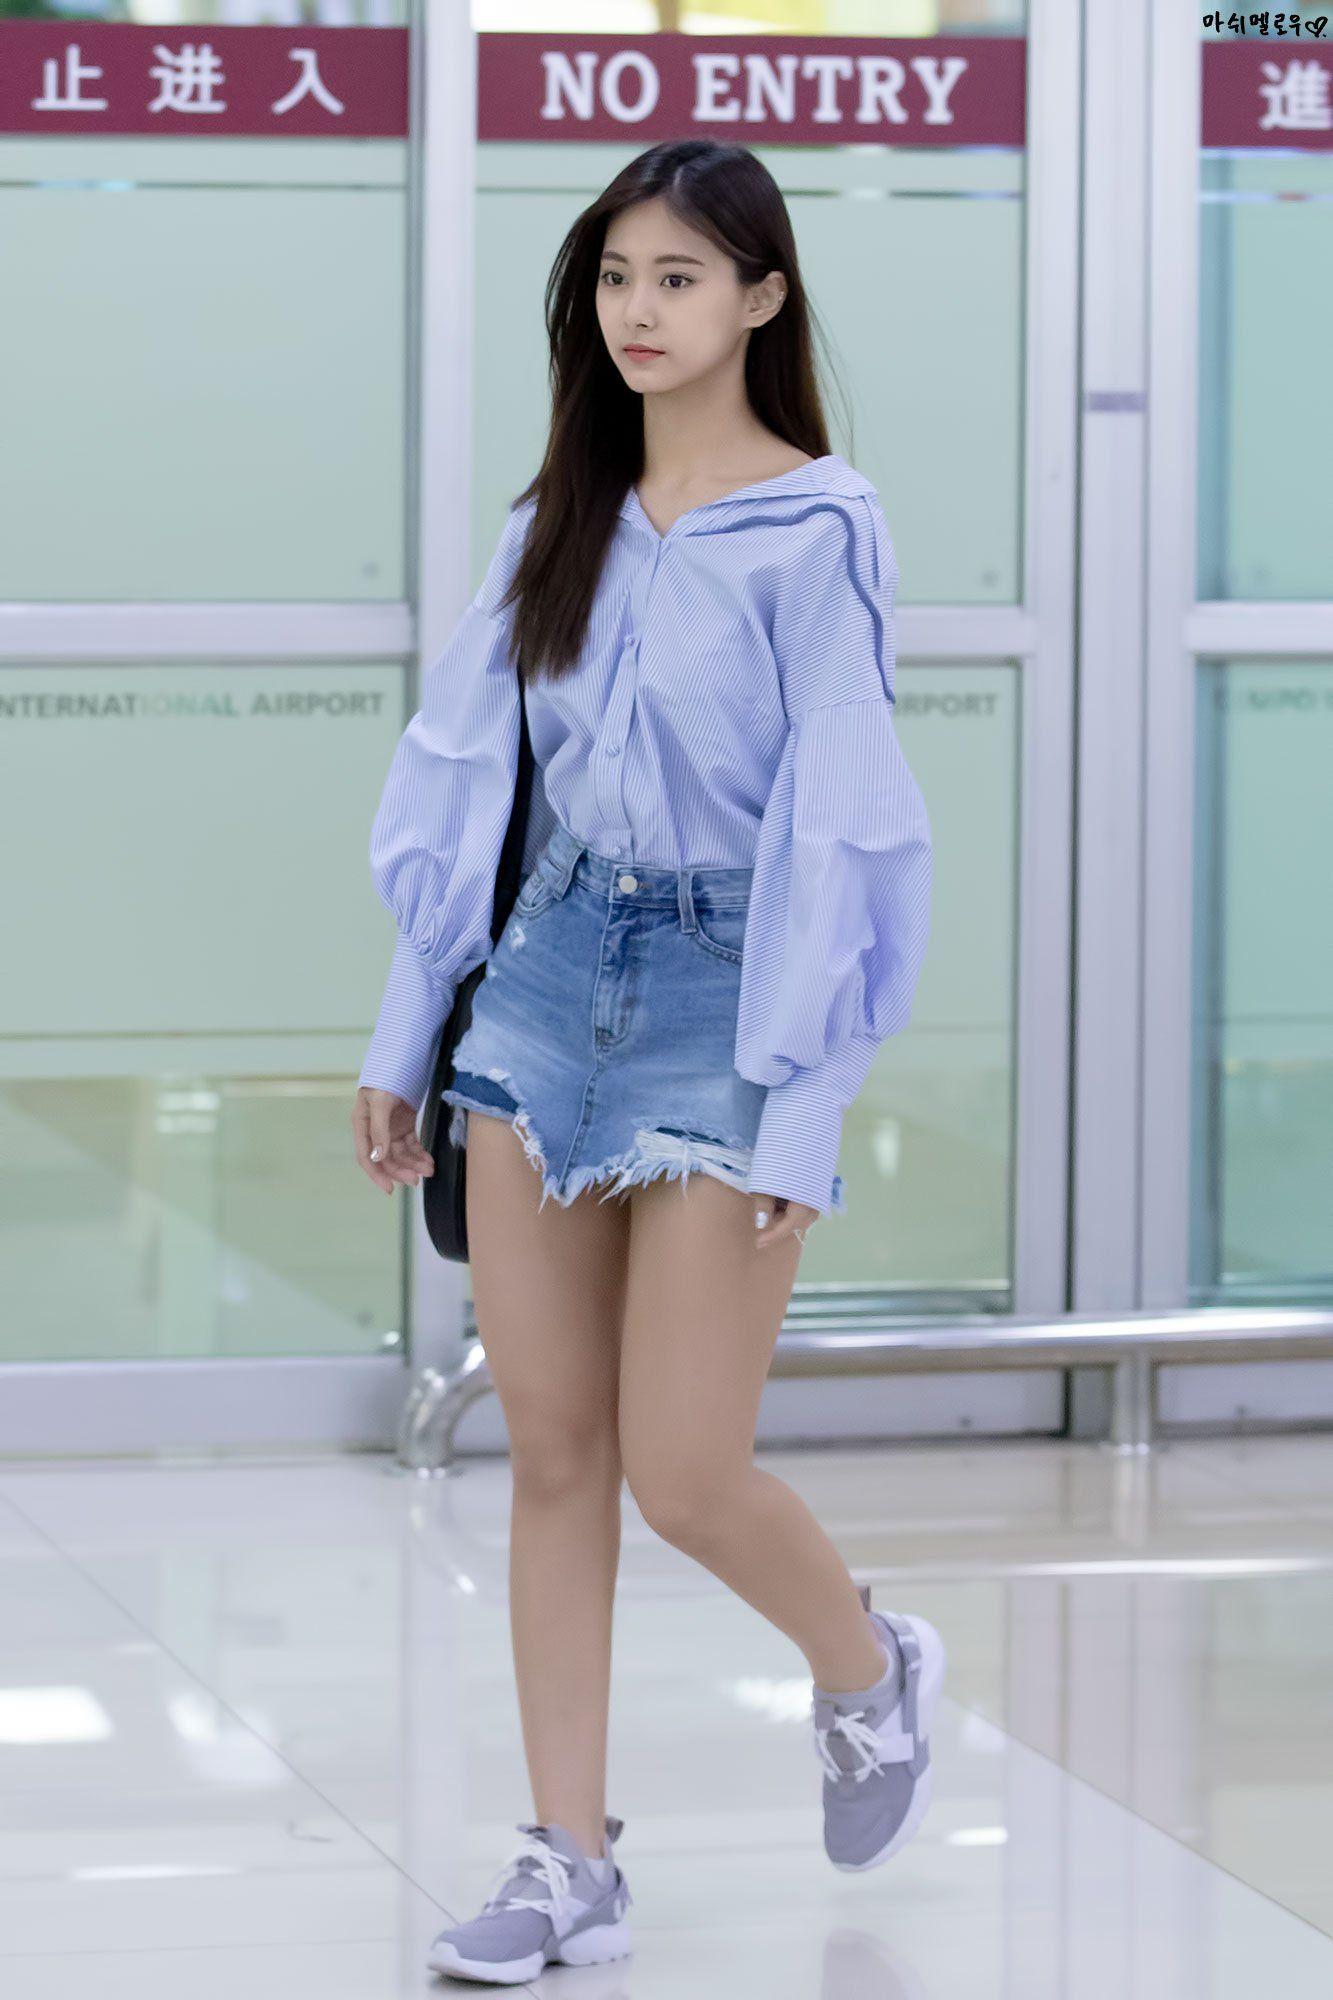 8 Kpop Airport Fashion ideas  fashion, korean fashion, kpop fashion